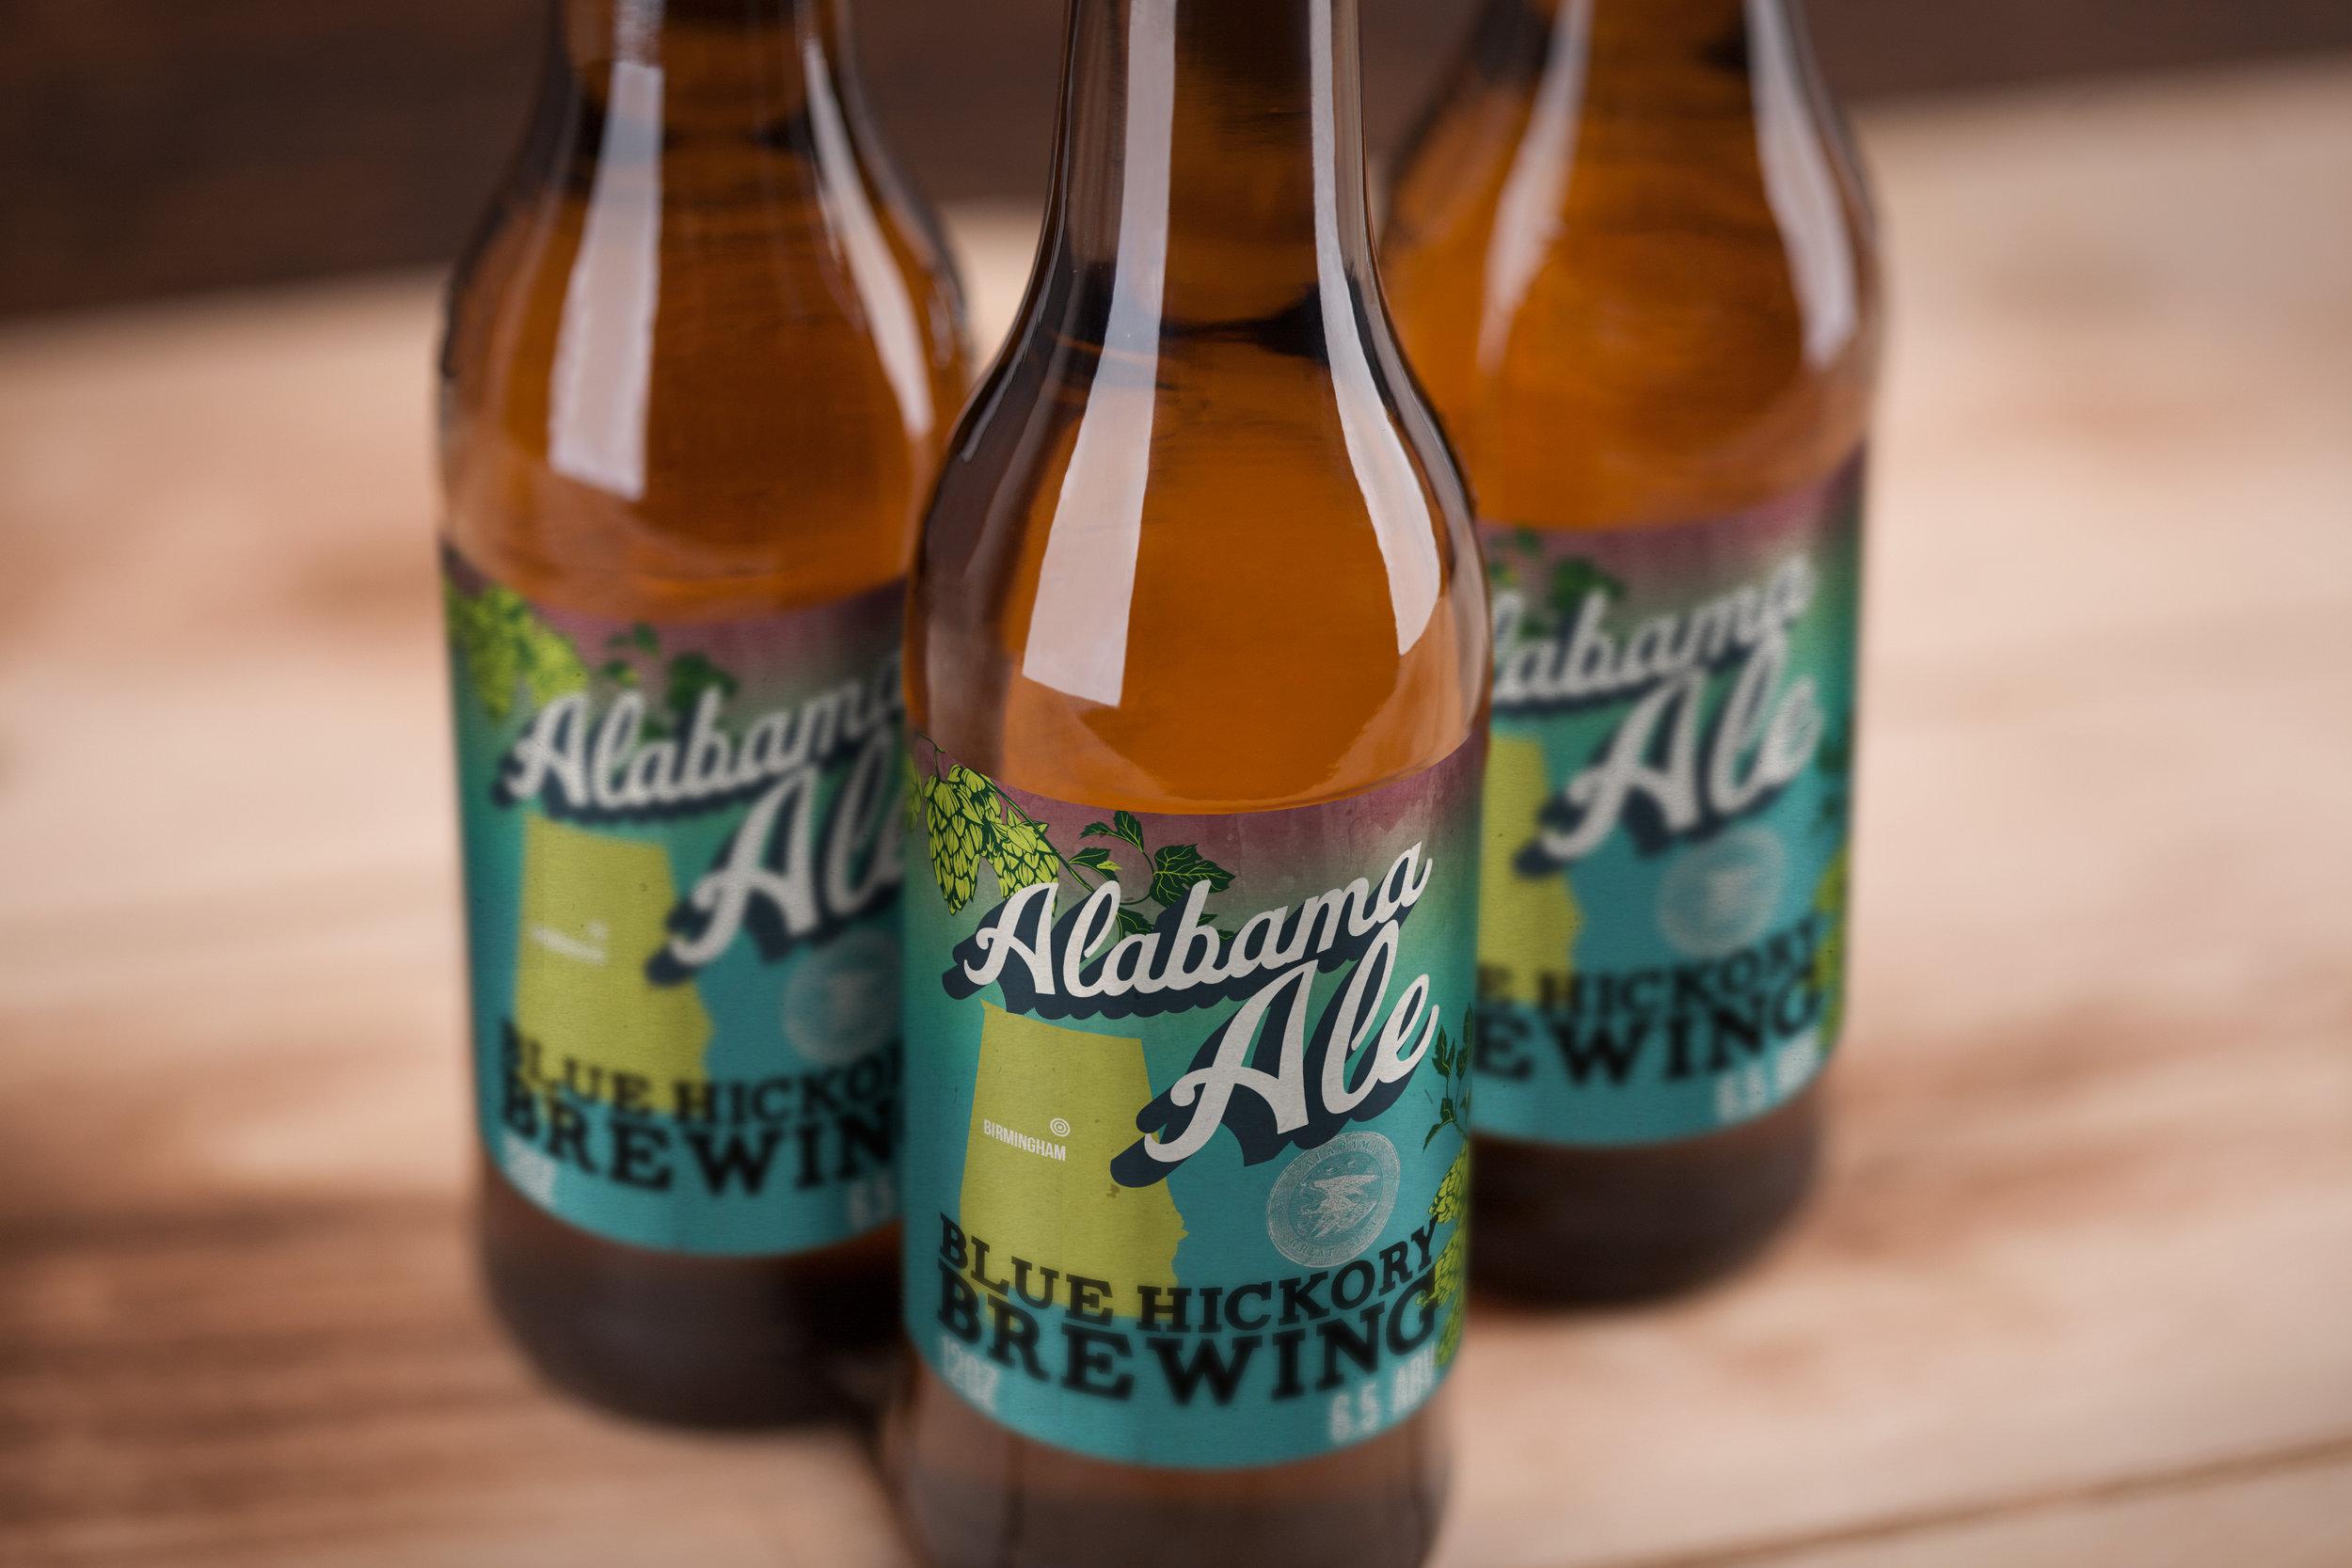 Alabama-Ale-Beer-Bottles.jpg